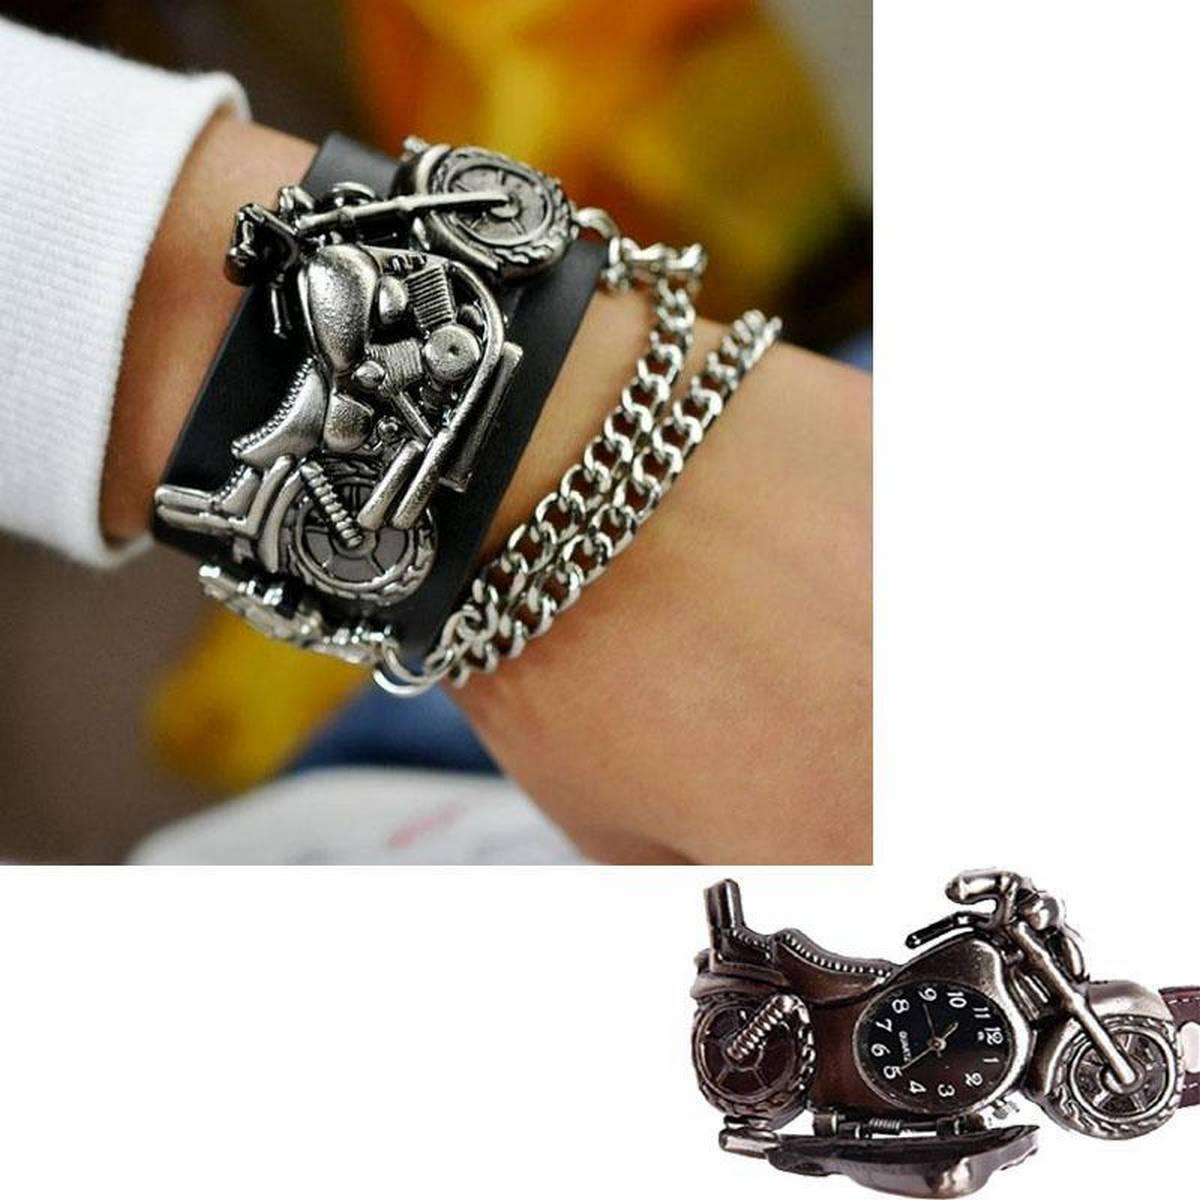 Cool Motorcycle Leather Wild Quartz Bracelet Watch For Unisex